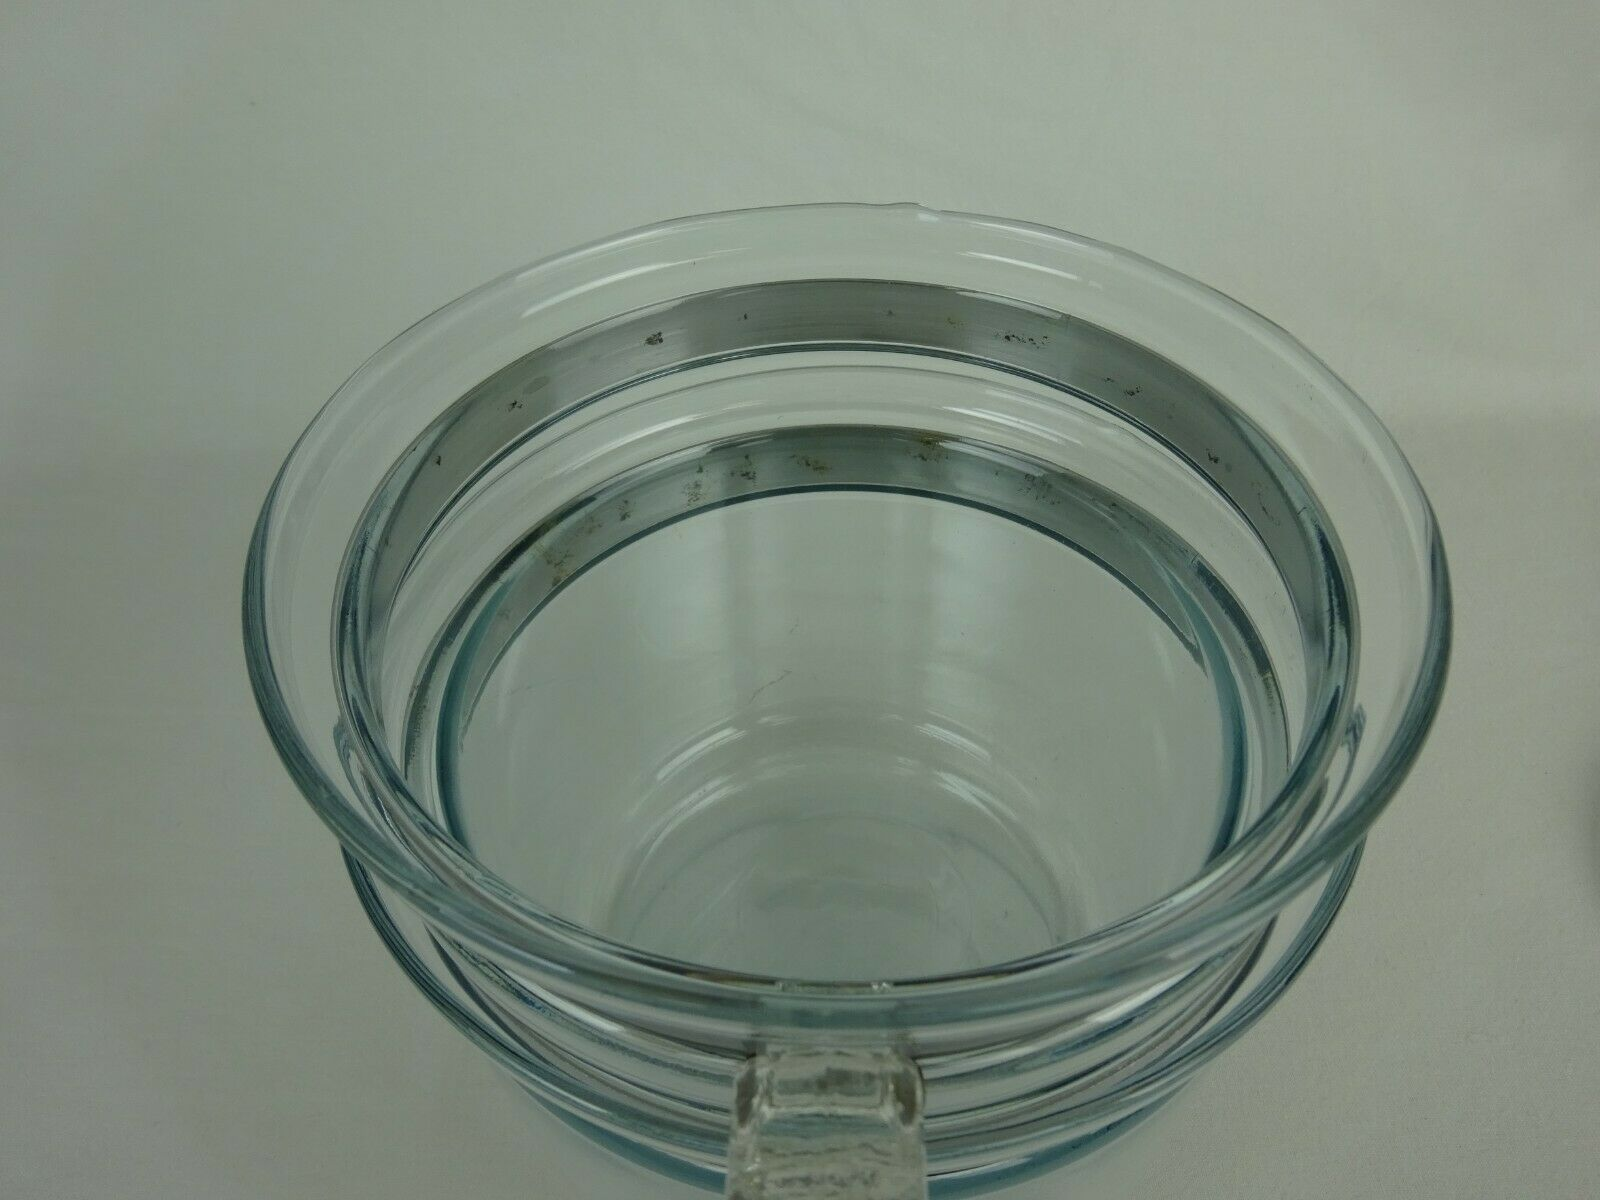 Pyrex Flameware Glass Double Boiler 1.5 Quart 6283  - $48.95